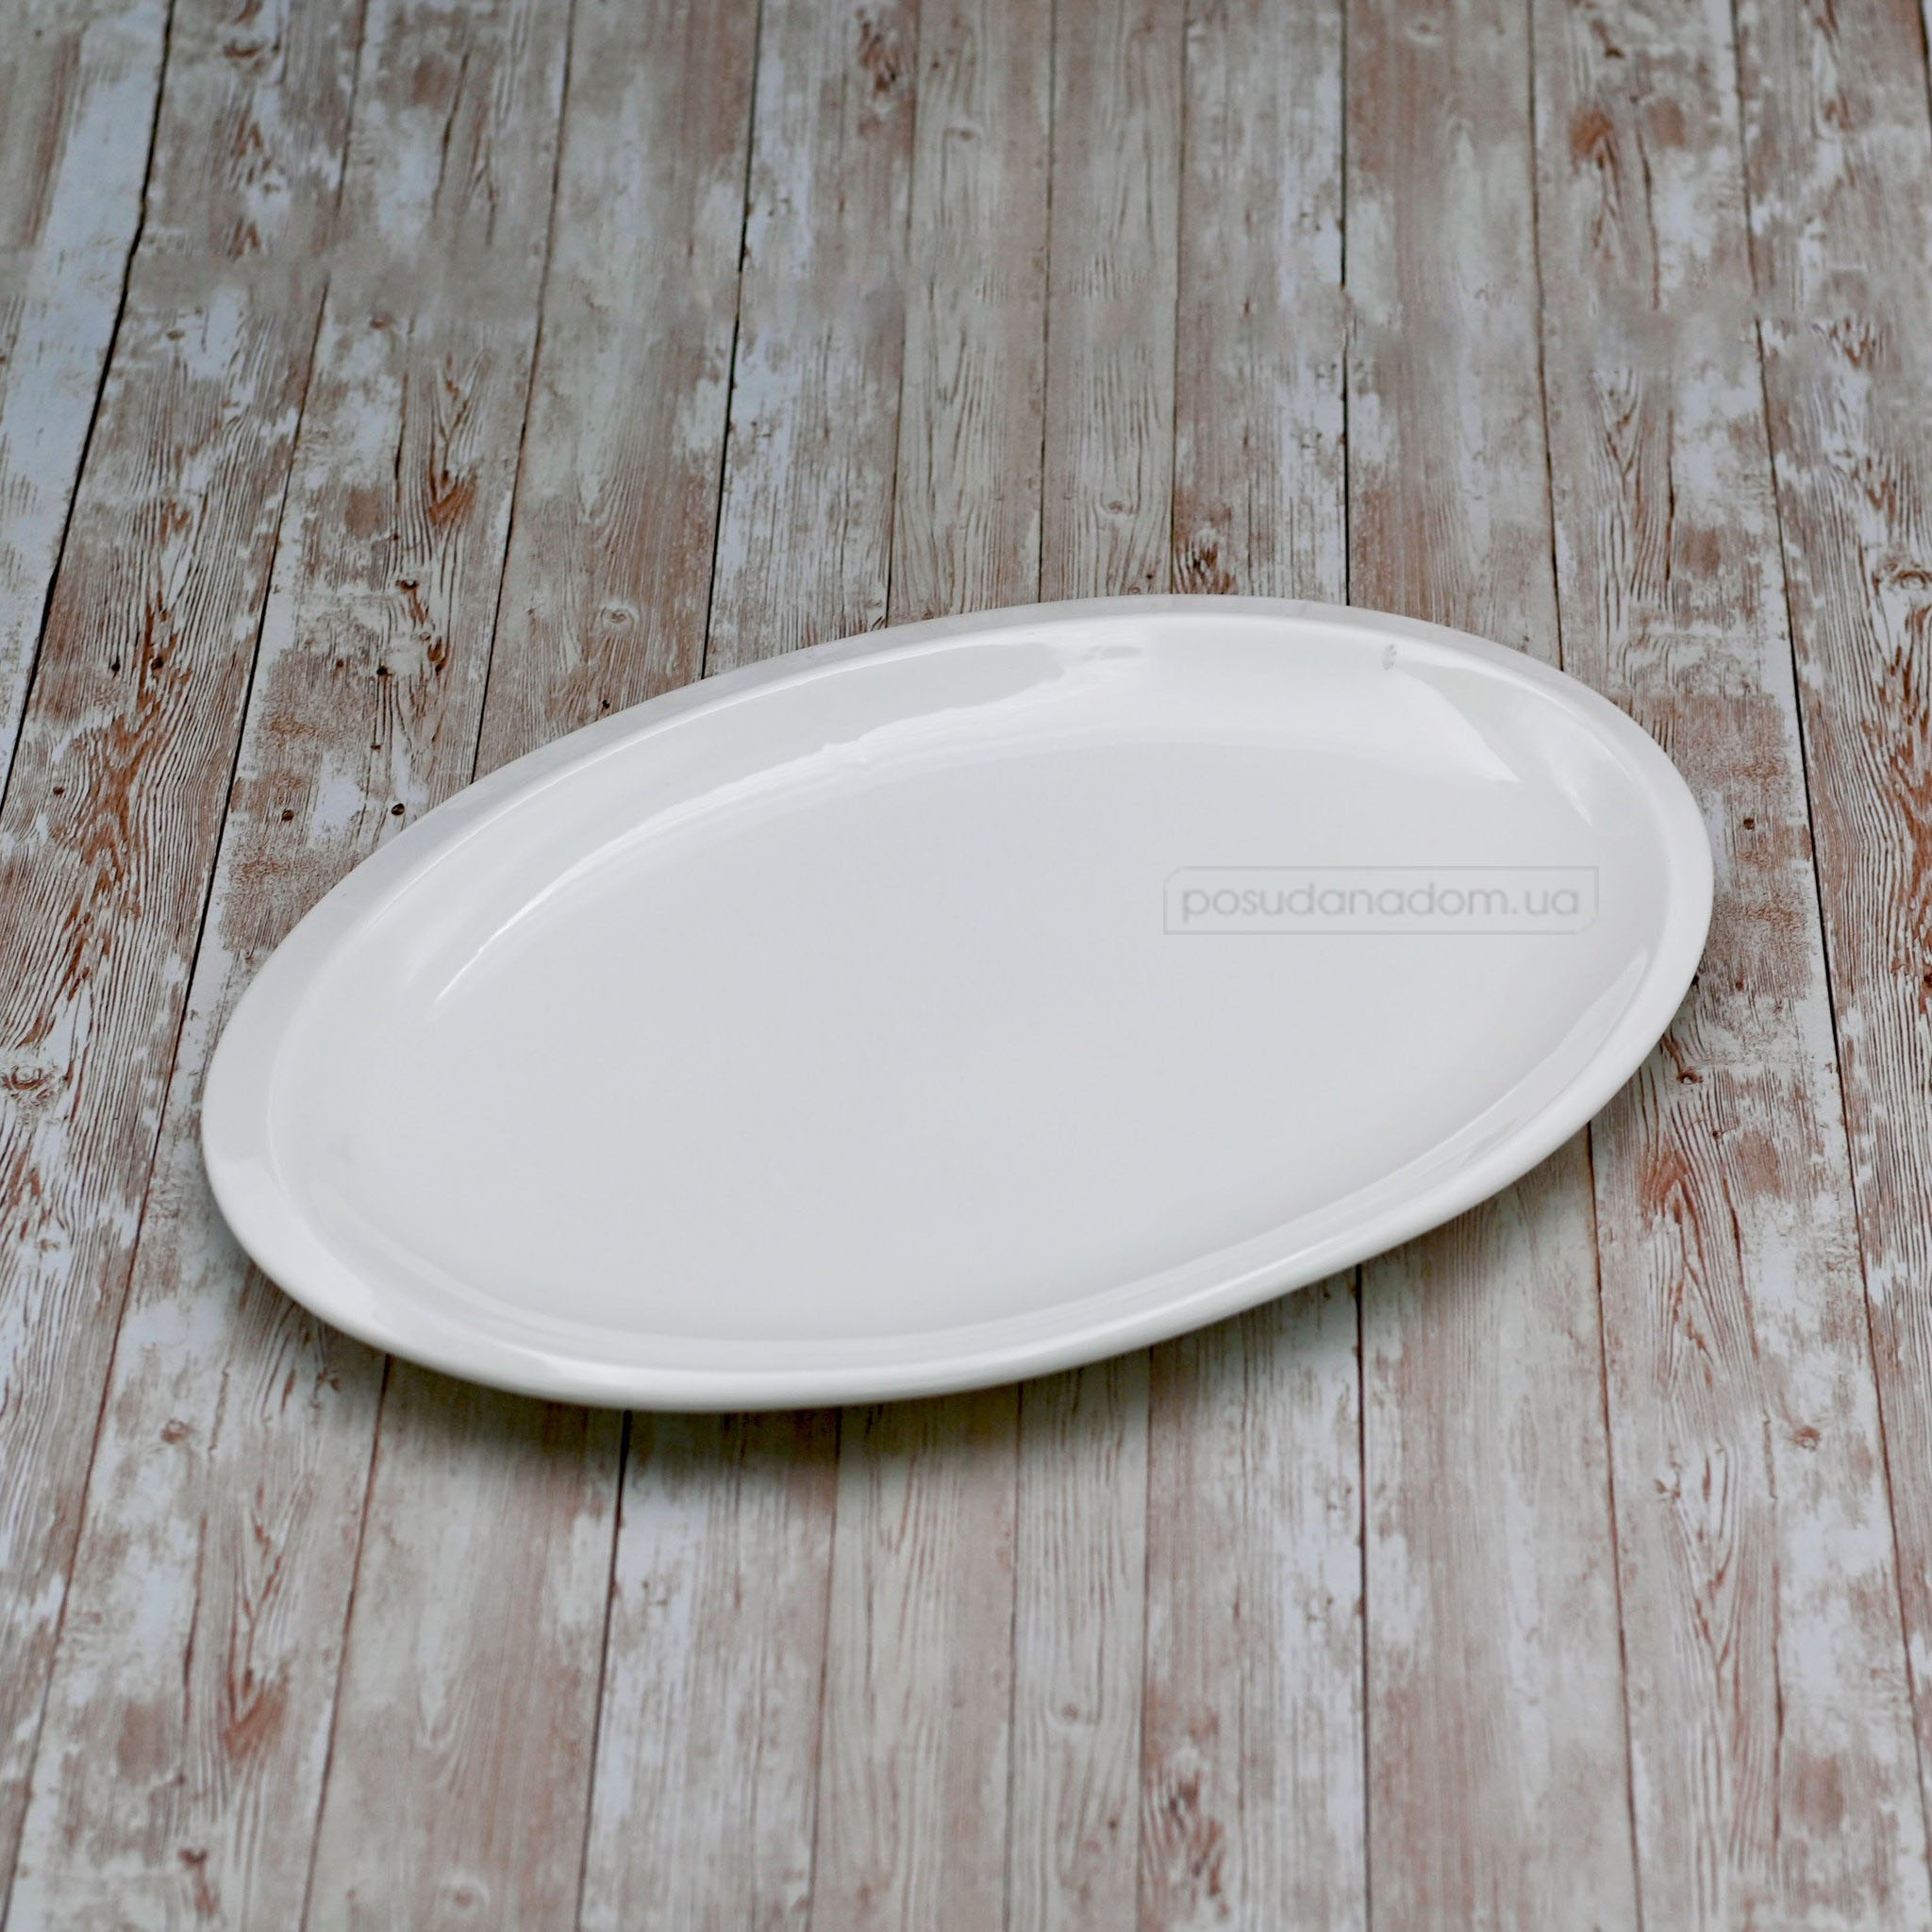 Блюдо овальное Wilmax WL-992022 Olivia 30.5 см, недорого